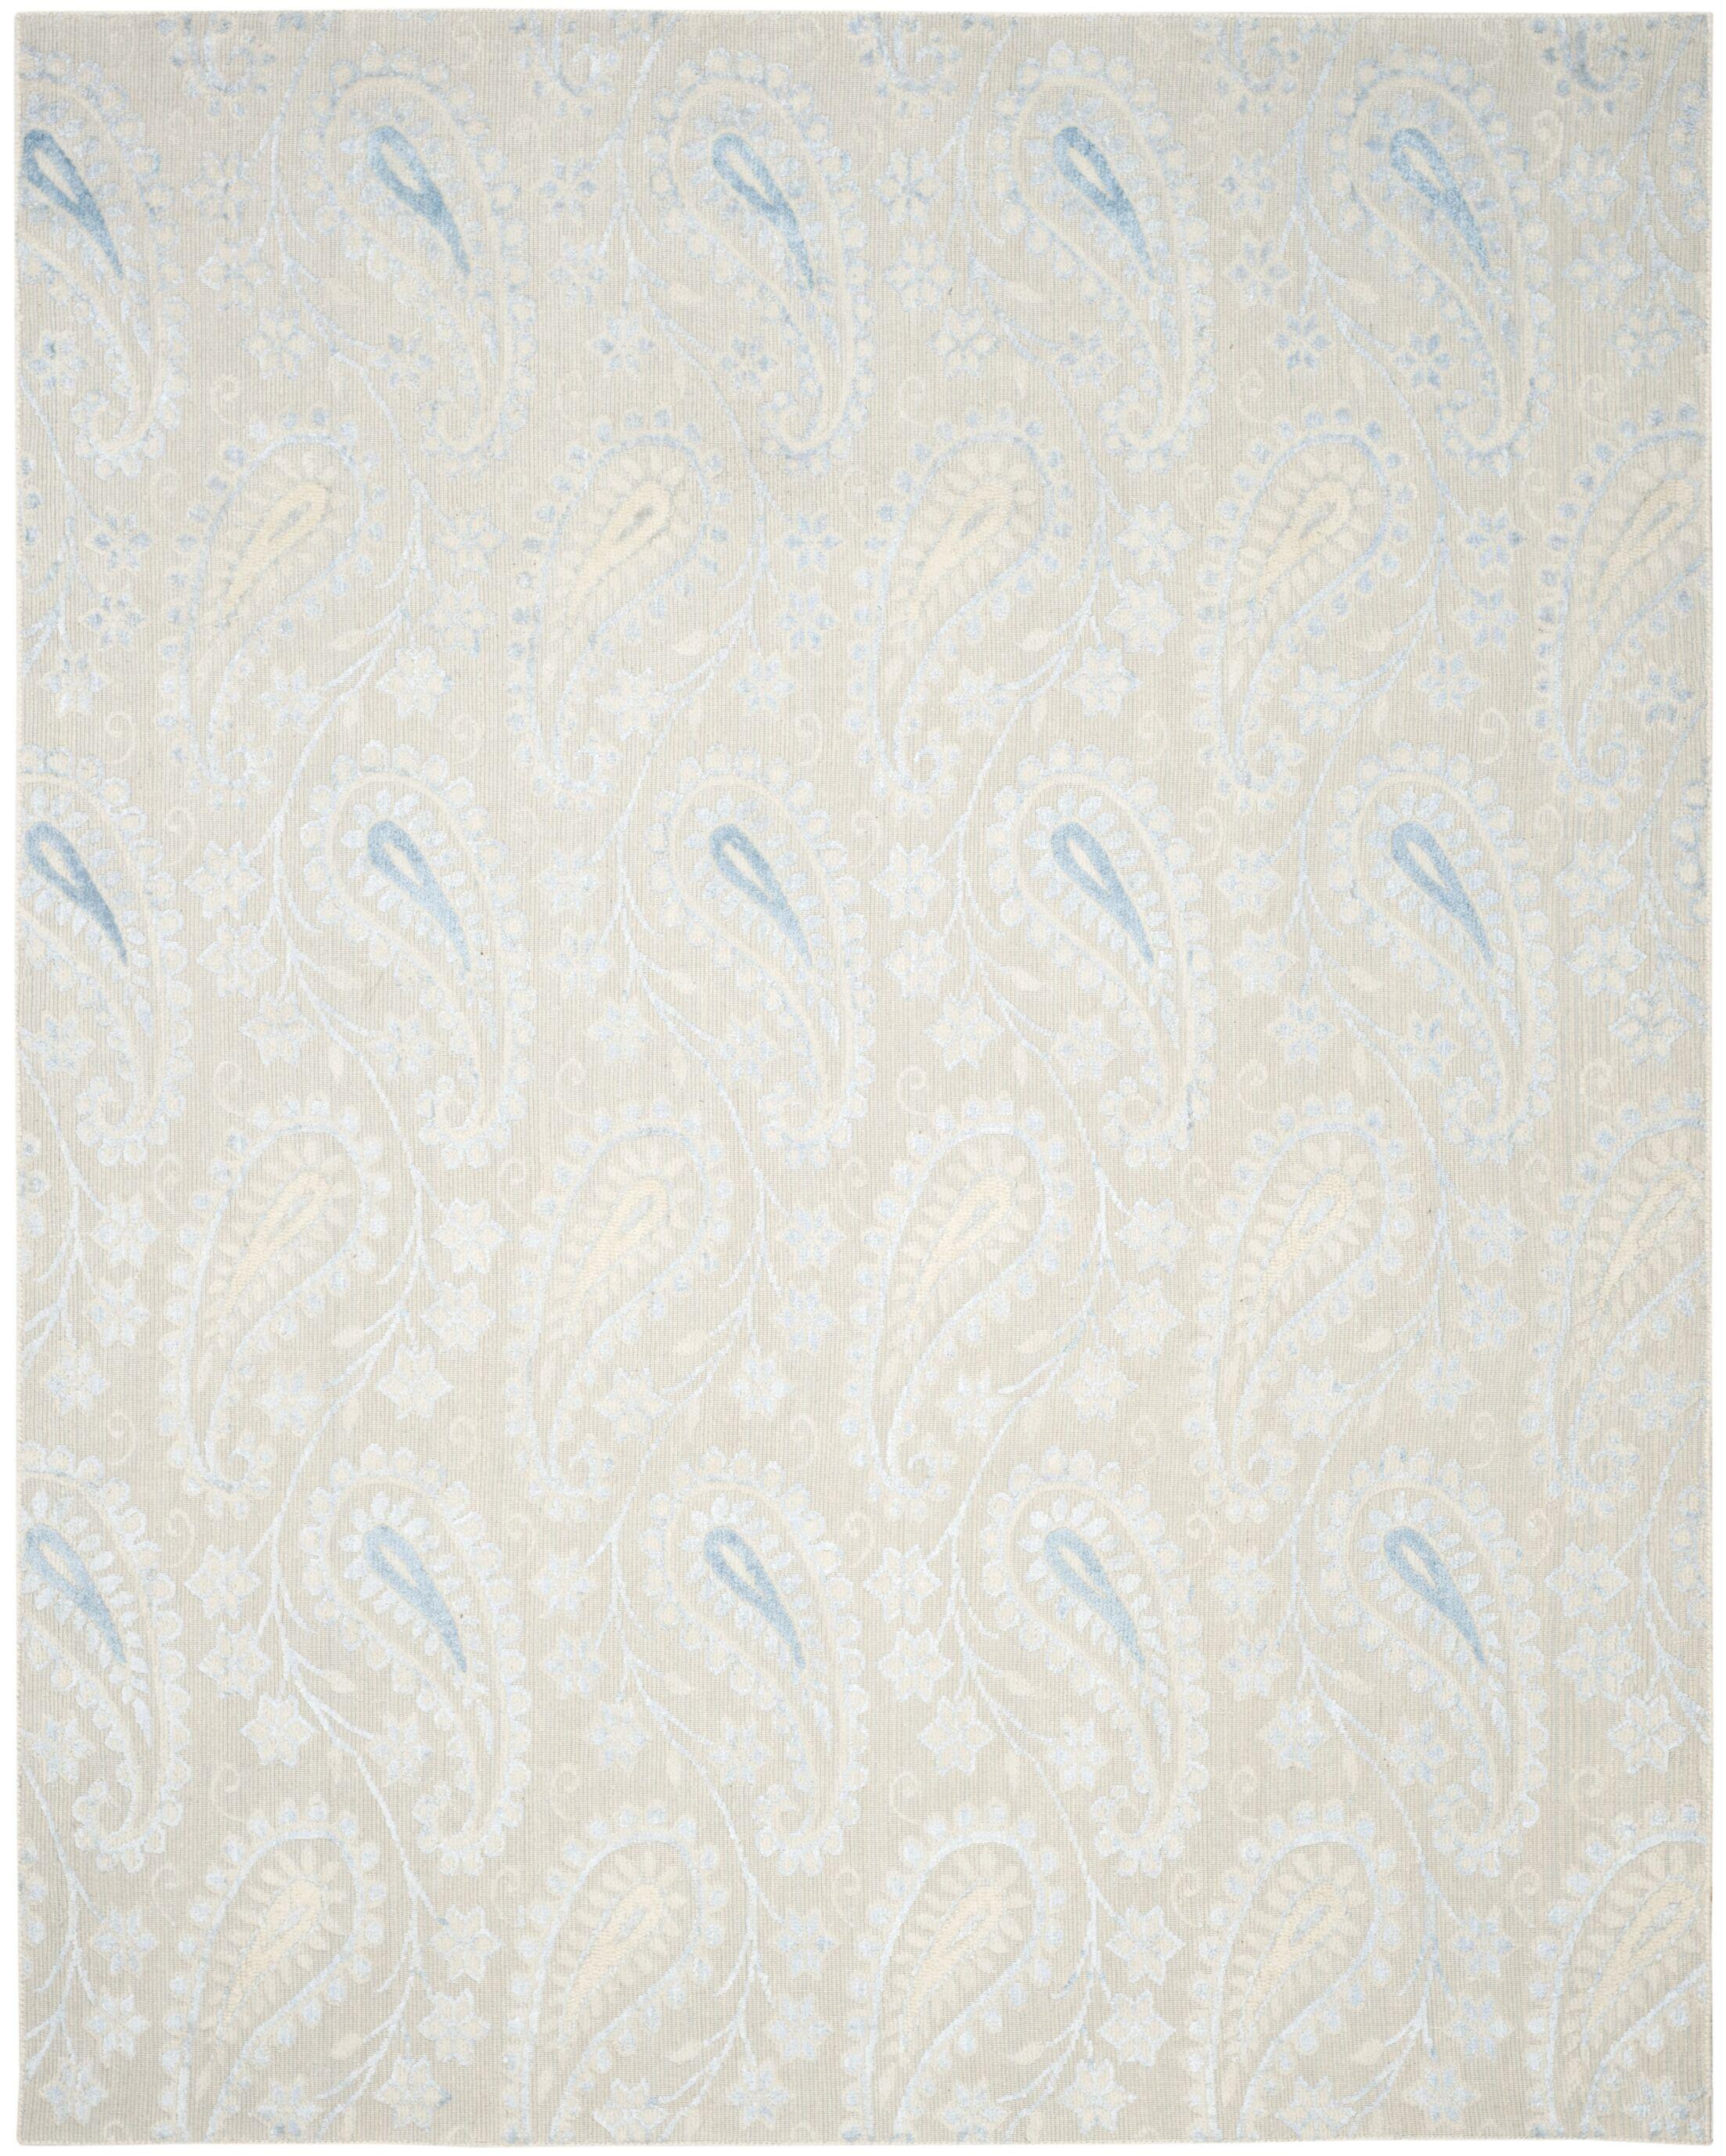 Erine Hand-Woven Light Blue/Beige Area Rug Rug Size: Rectangle 8' x 10'